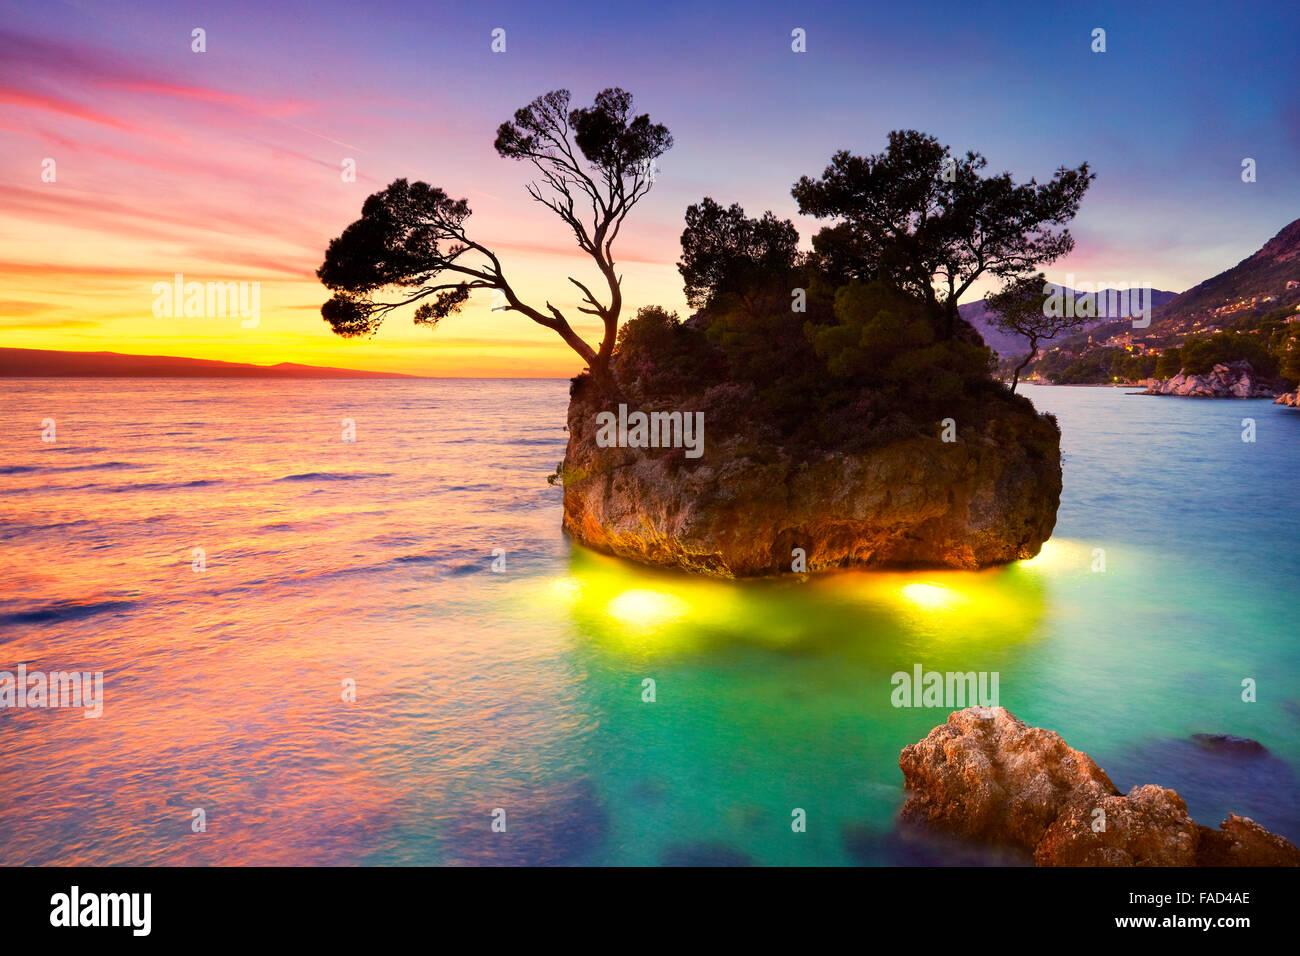 La côte de la Croatie, Makarska Riviera, Brela beach au coucher du soleil, la Croatie Photo Stock